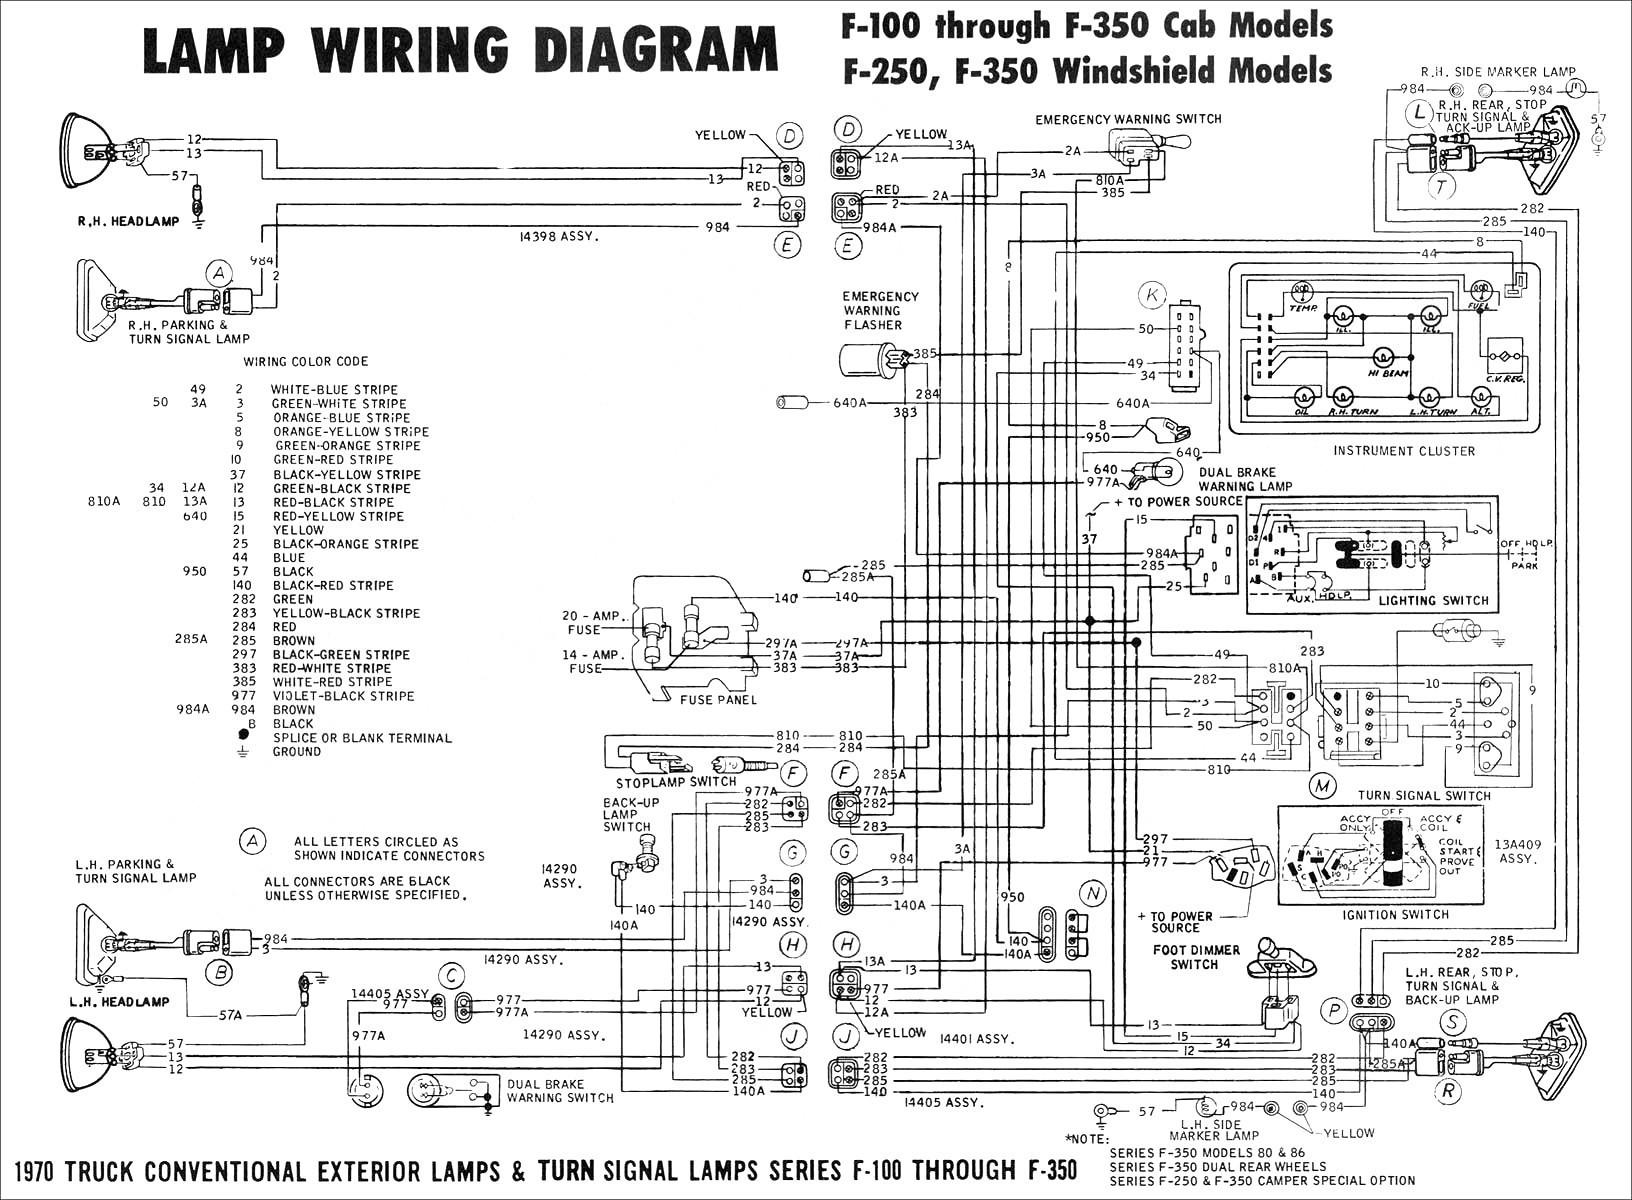 Dyson Vacuum Parts Diagram 2001 ford F350 Door Diagram Reinvent Your Wiring Diagram • Of Dyson Vacuum Parts Diagram